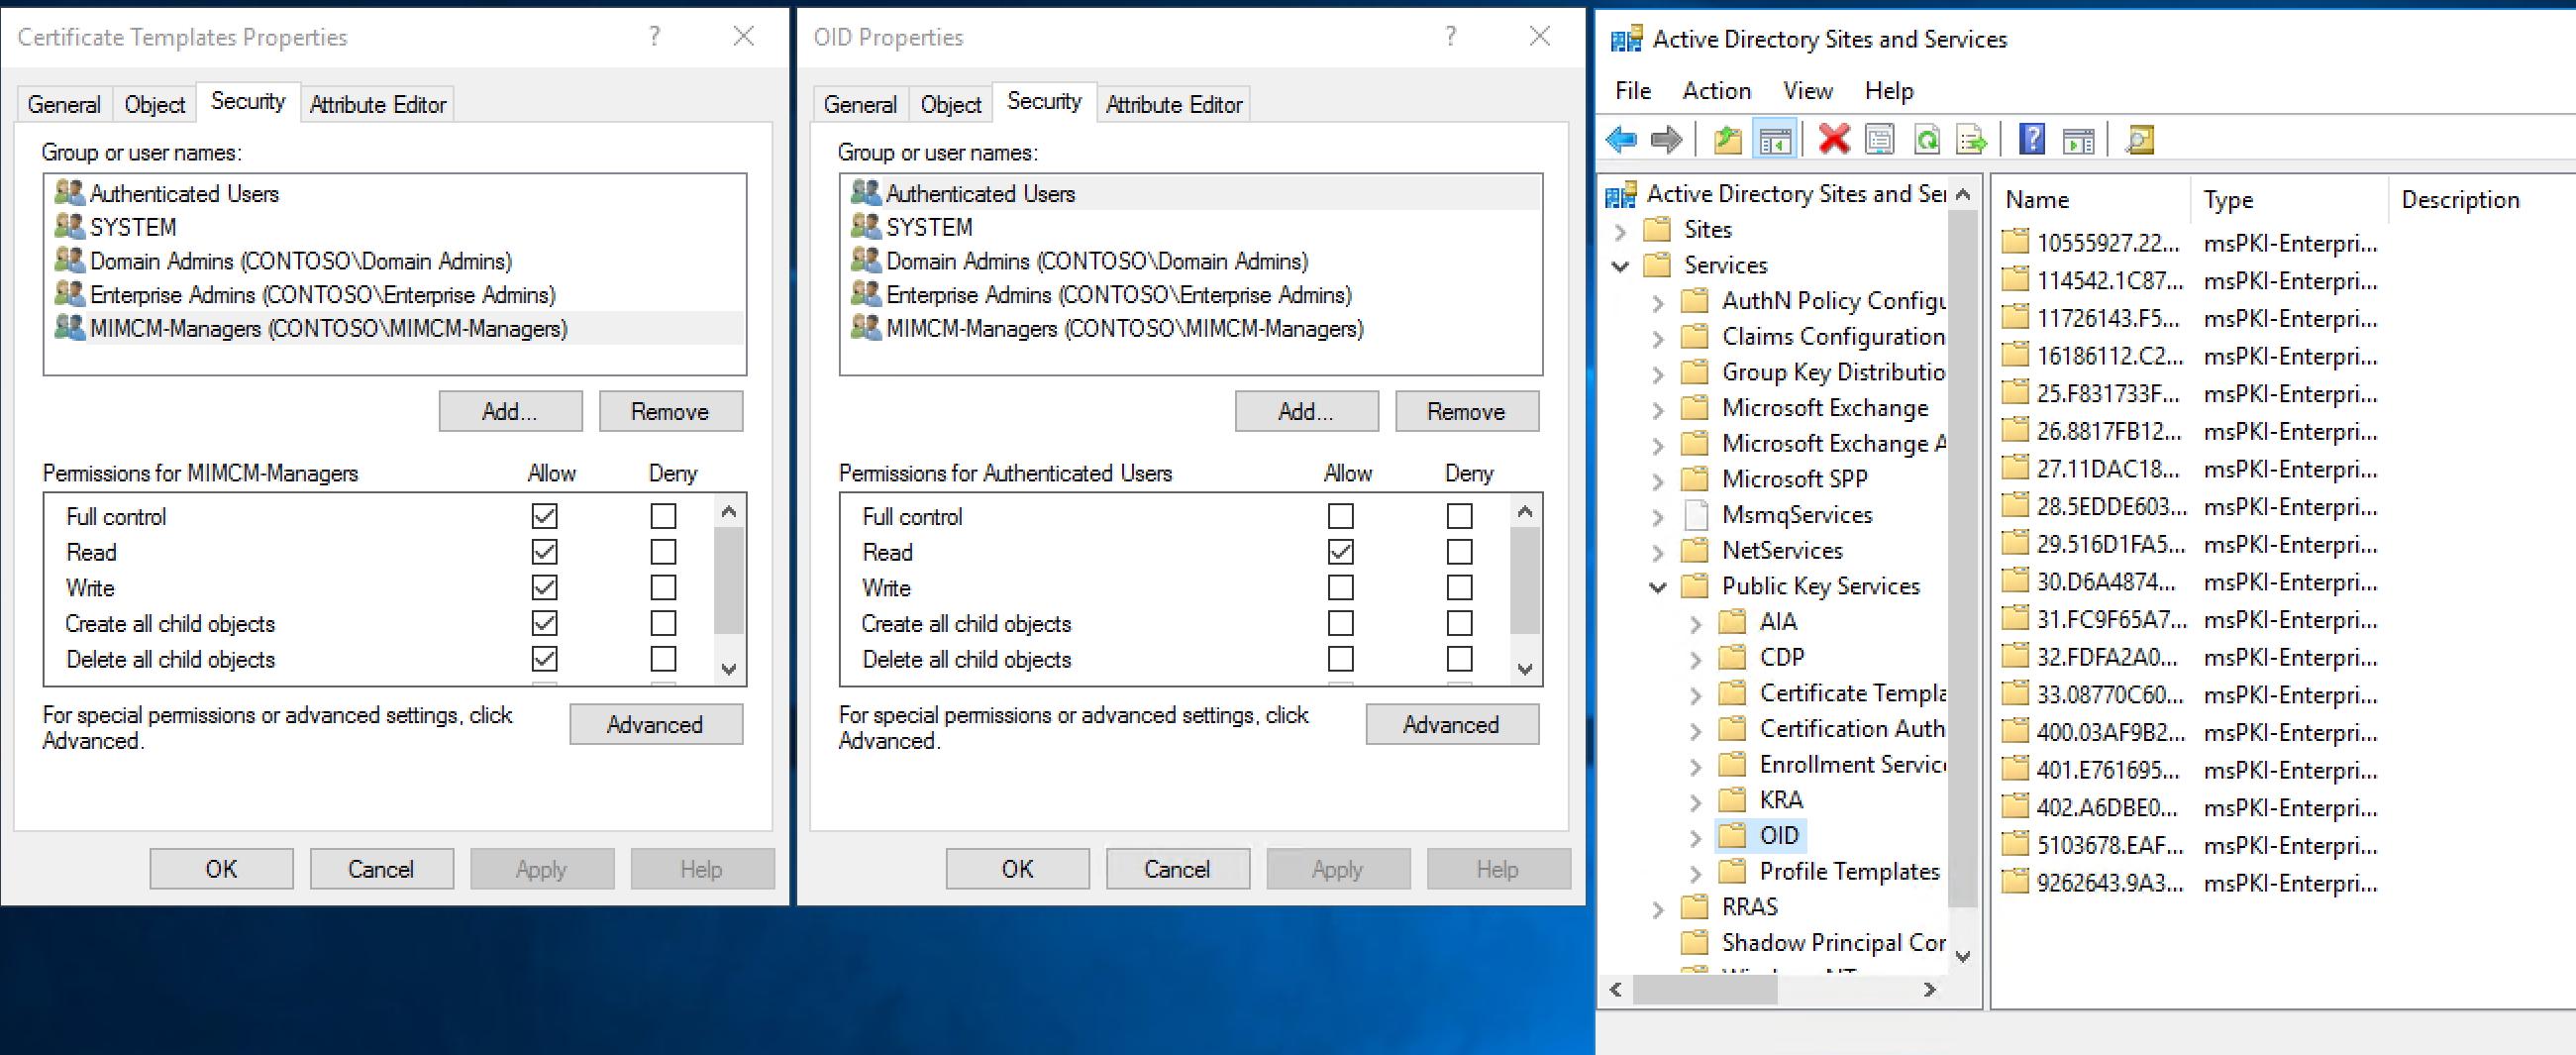 Microsoft identity manager certificate manager microsoft docs ct adcncertificate templatescnpublic key servicescnservicescnconfigurationdccontosodccom pt adcnprofile templates yelopaper Gallery